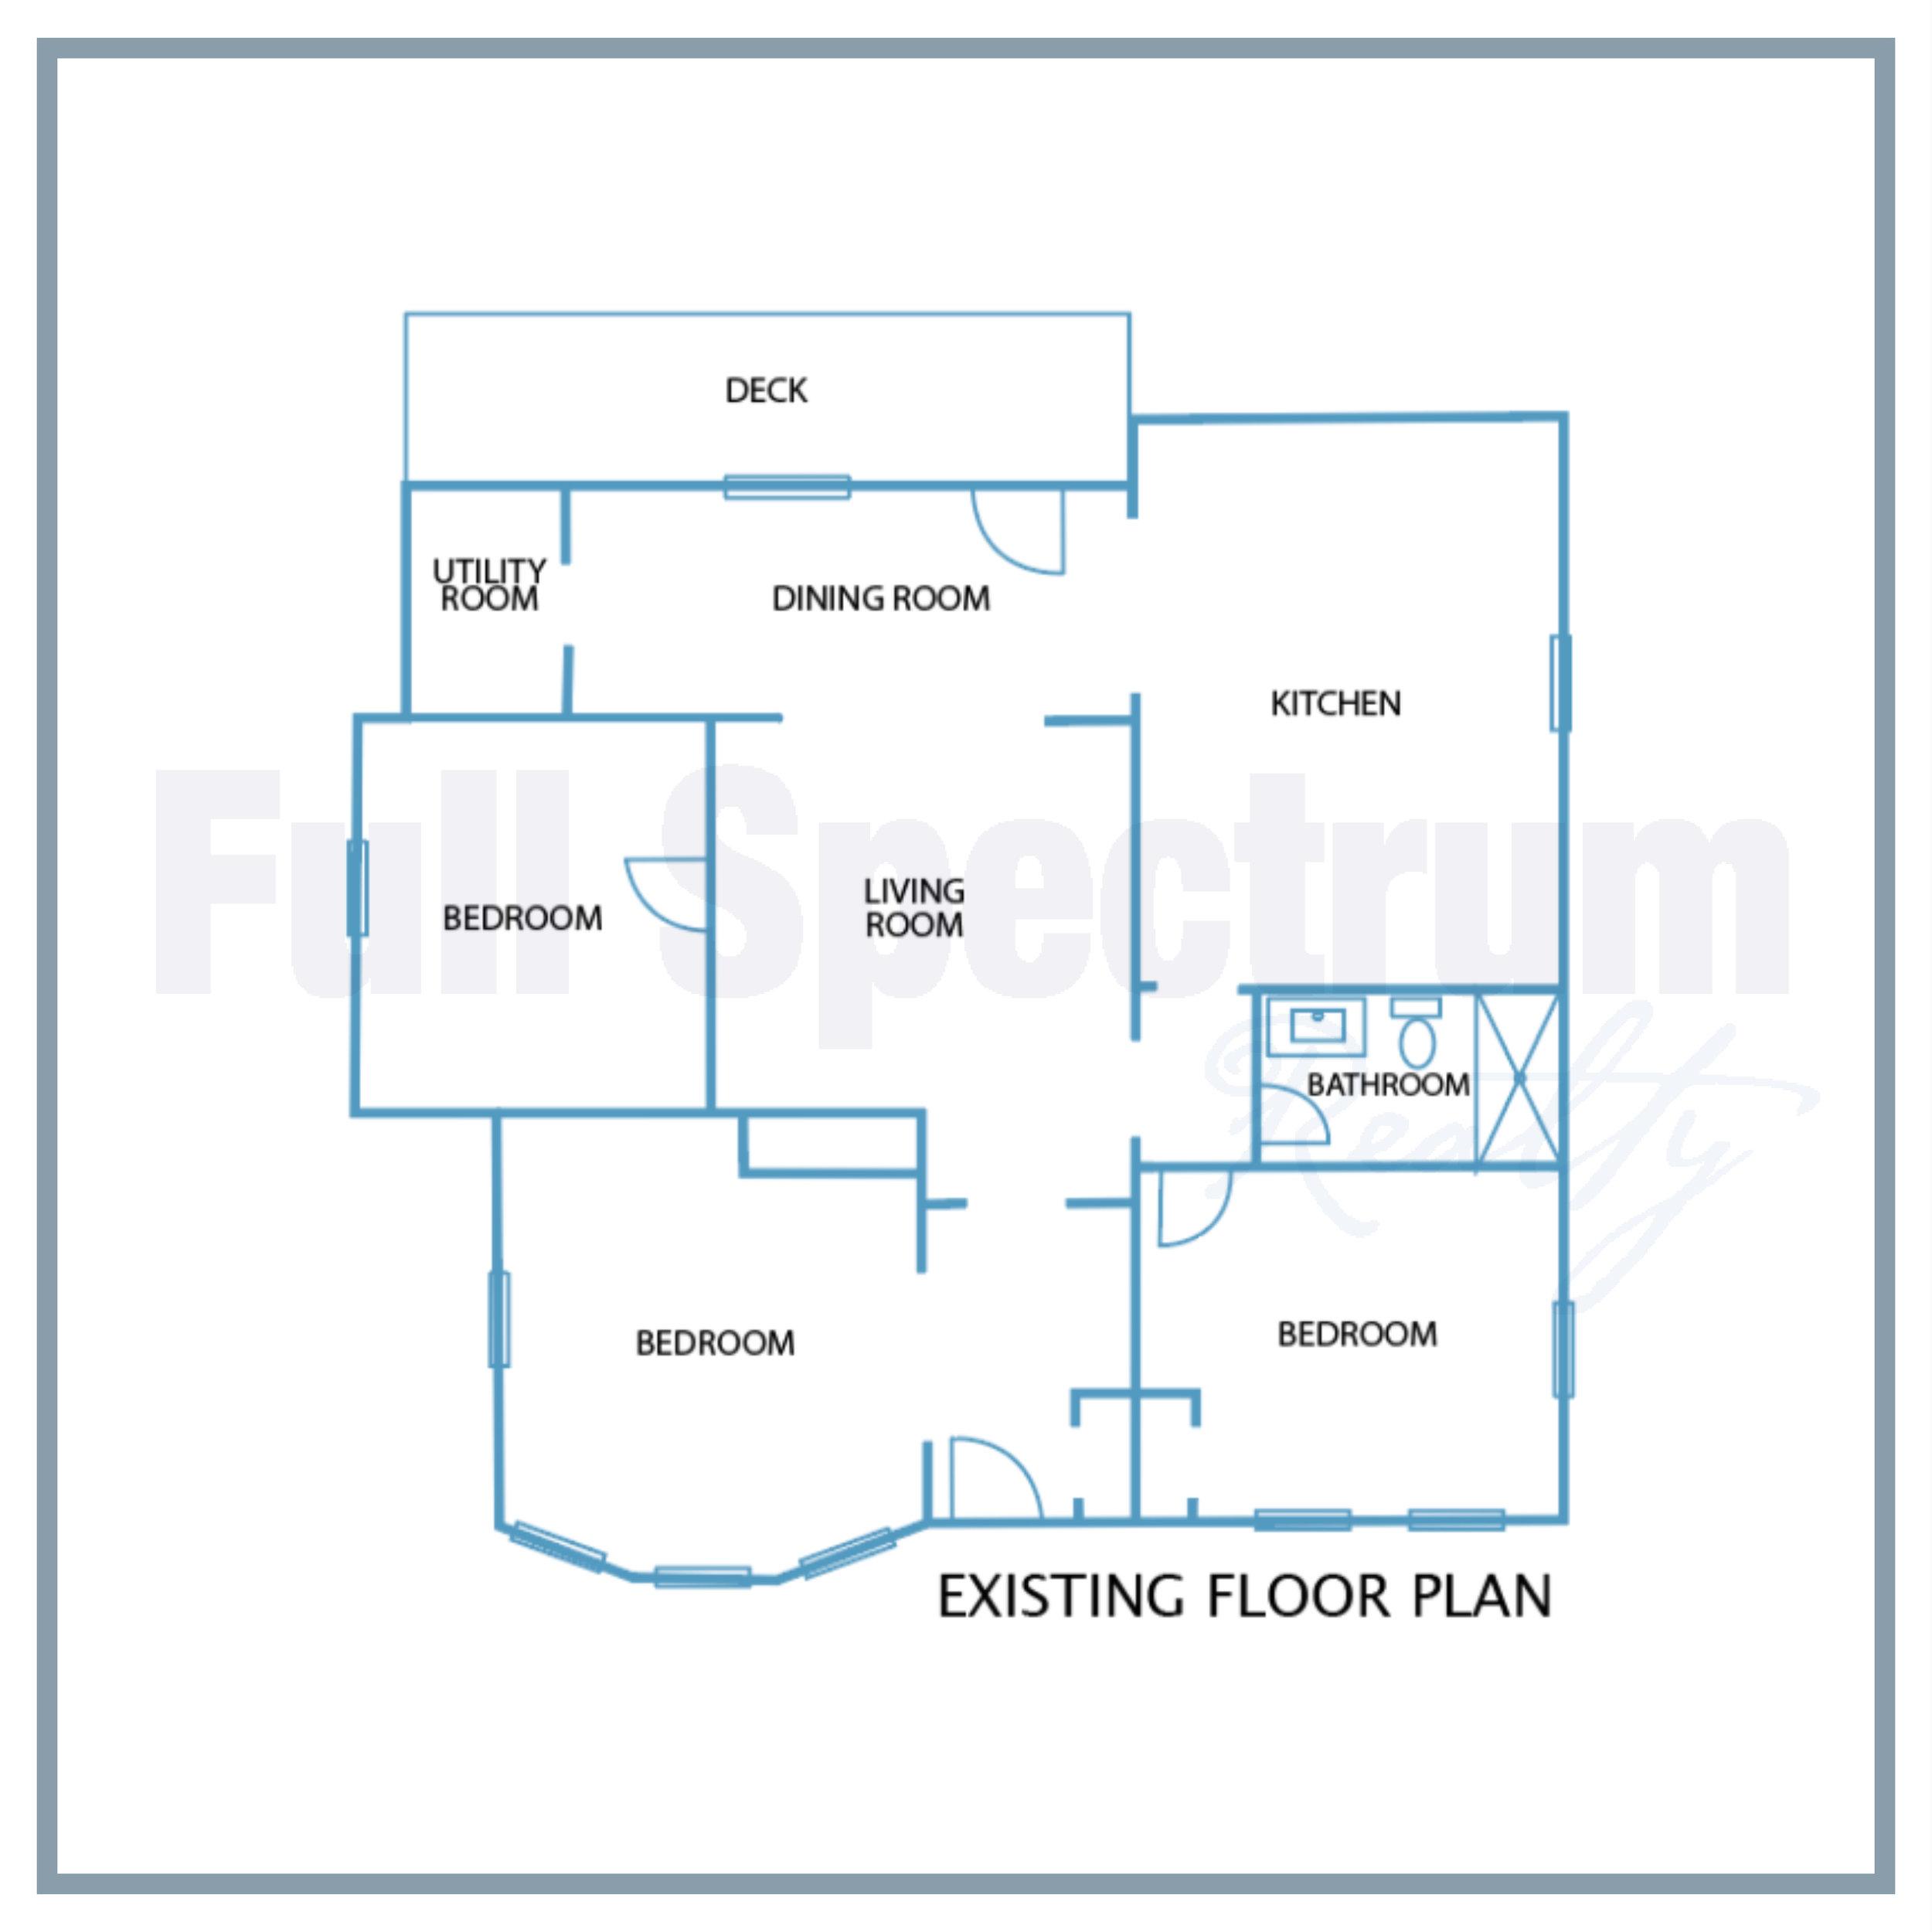 Original historic floor plan